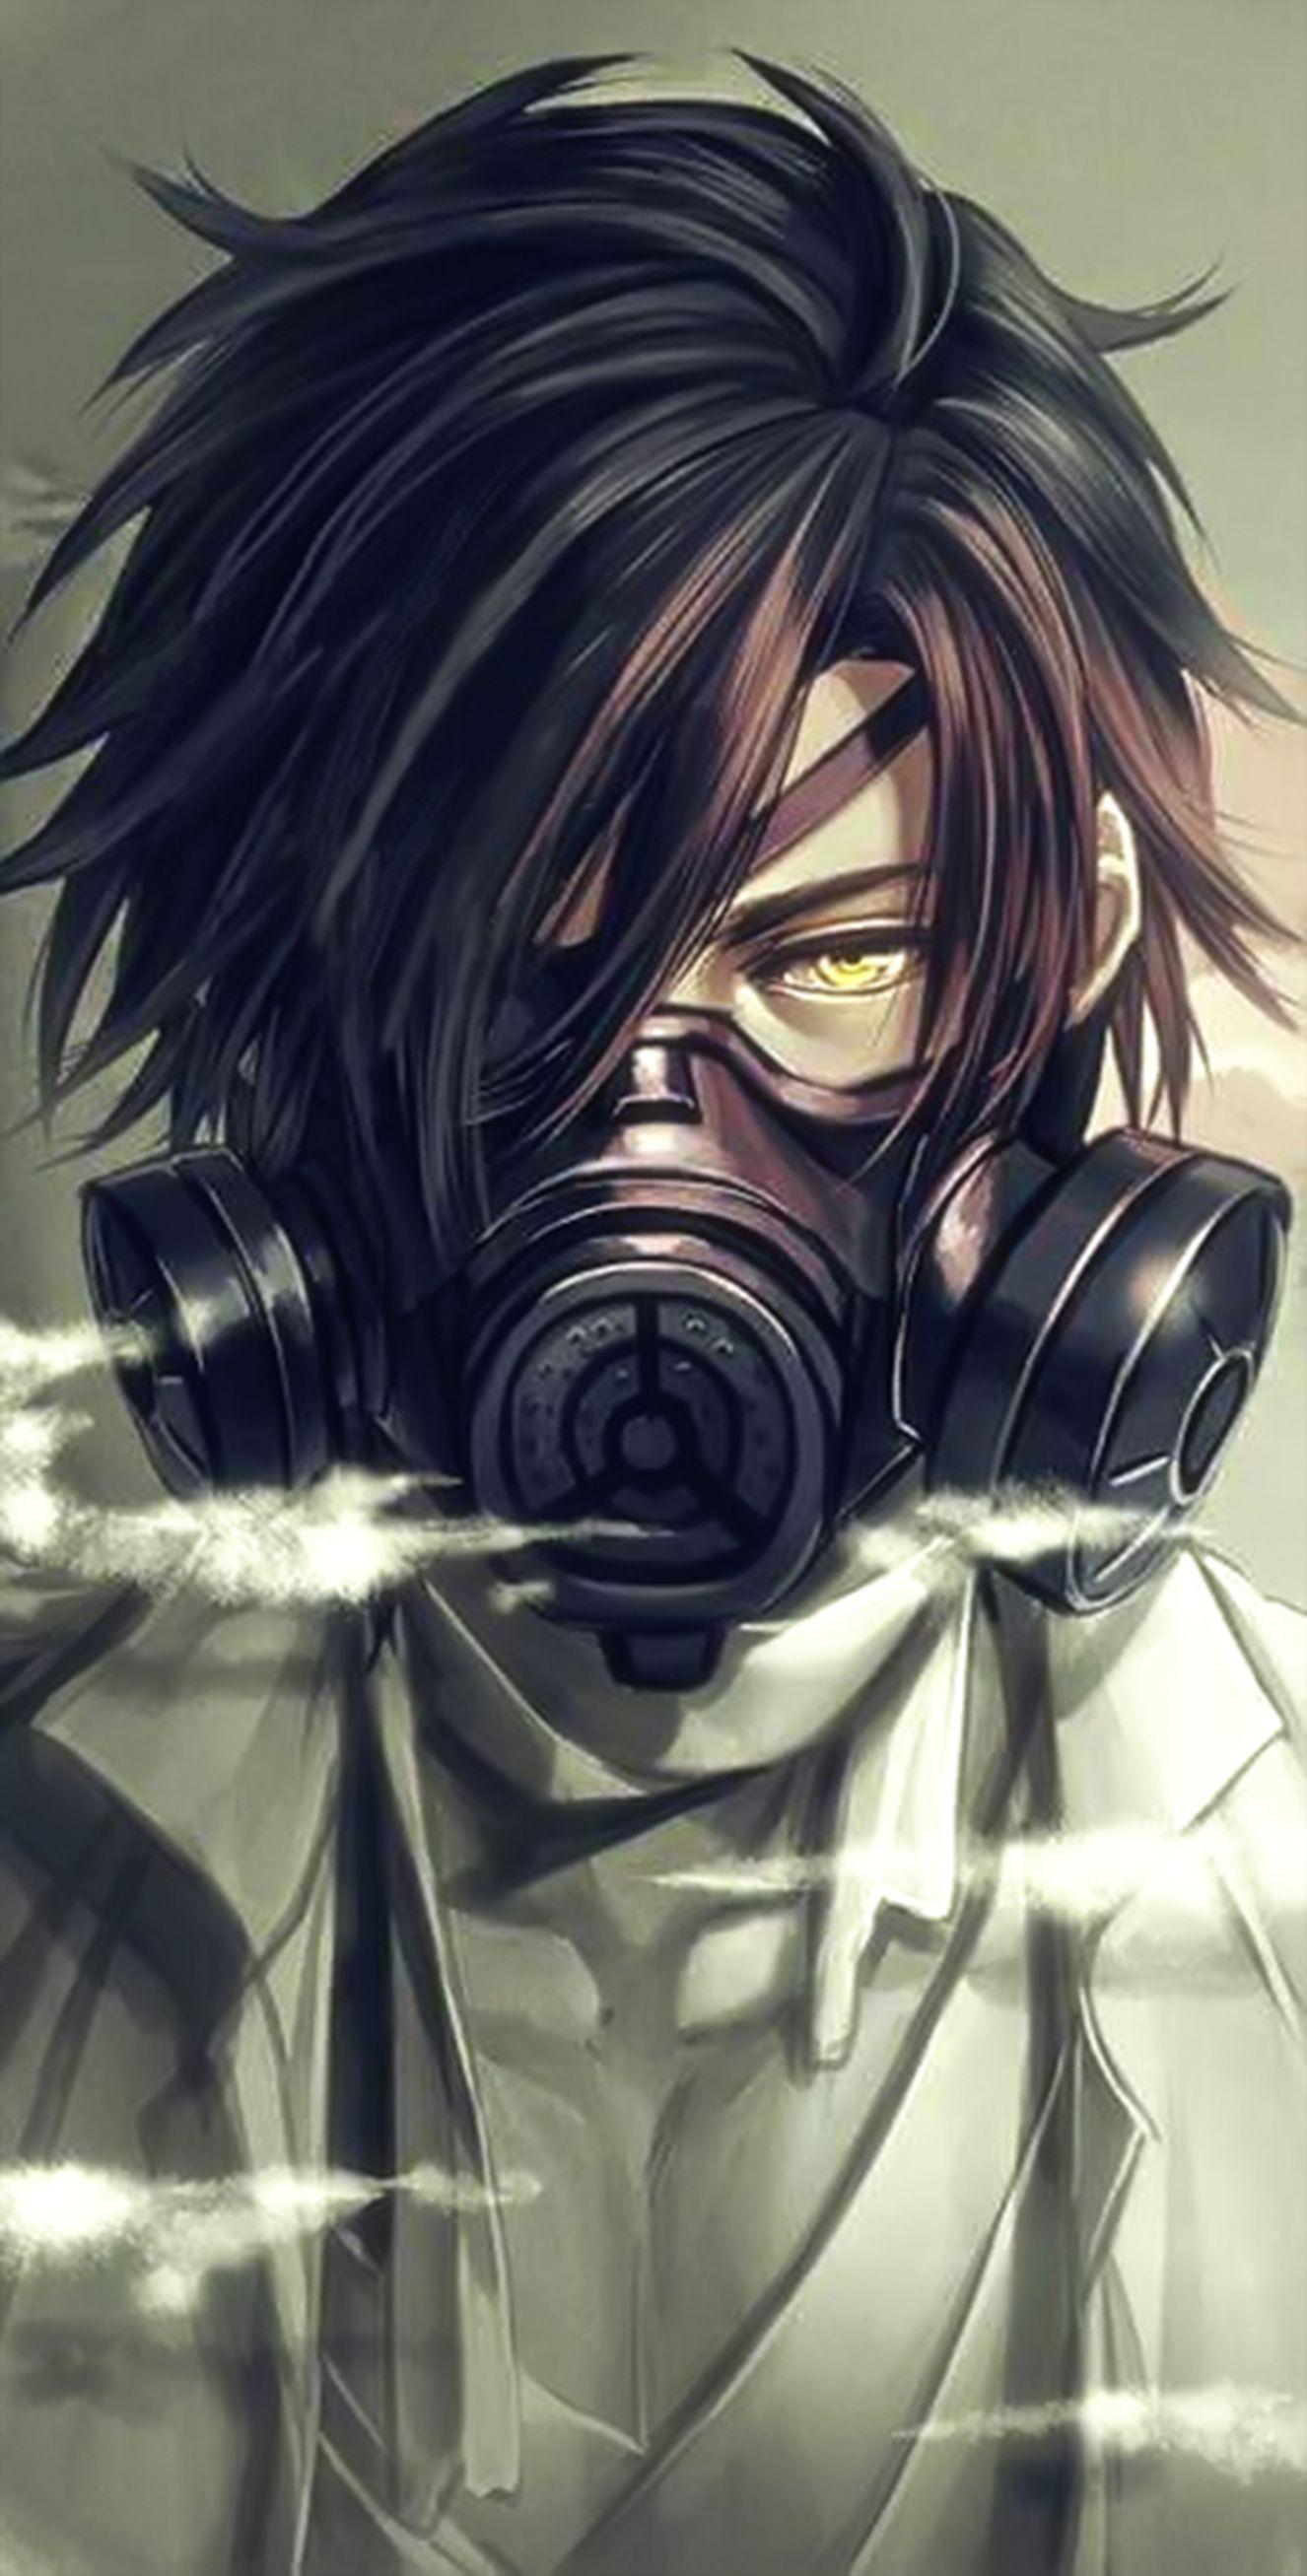 Anime Boy Mask Sparkstar Tv Edit Anime Guys Cool Anime Guys Dark Anime